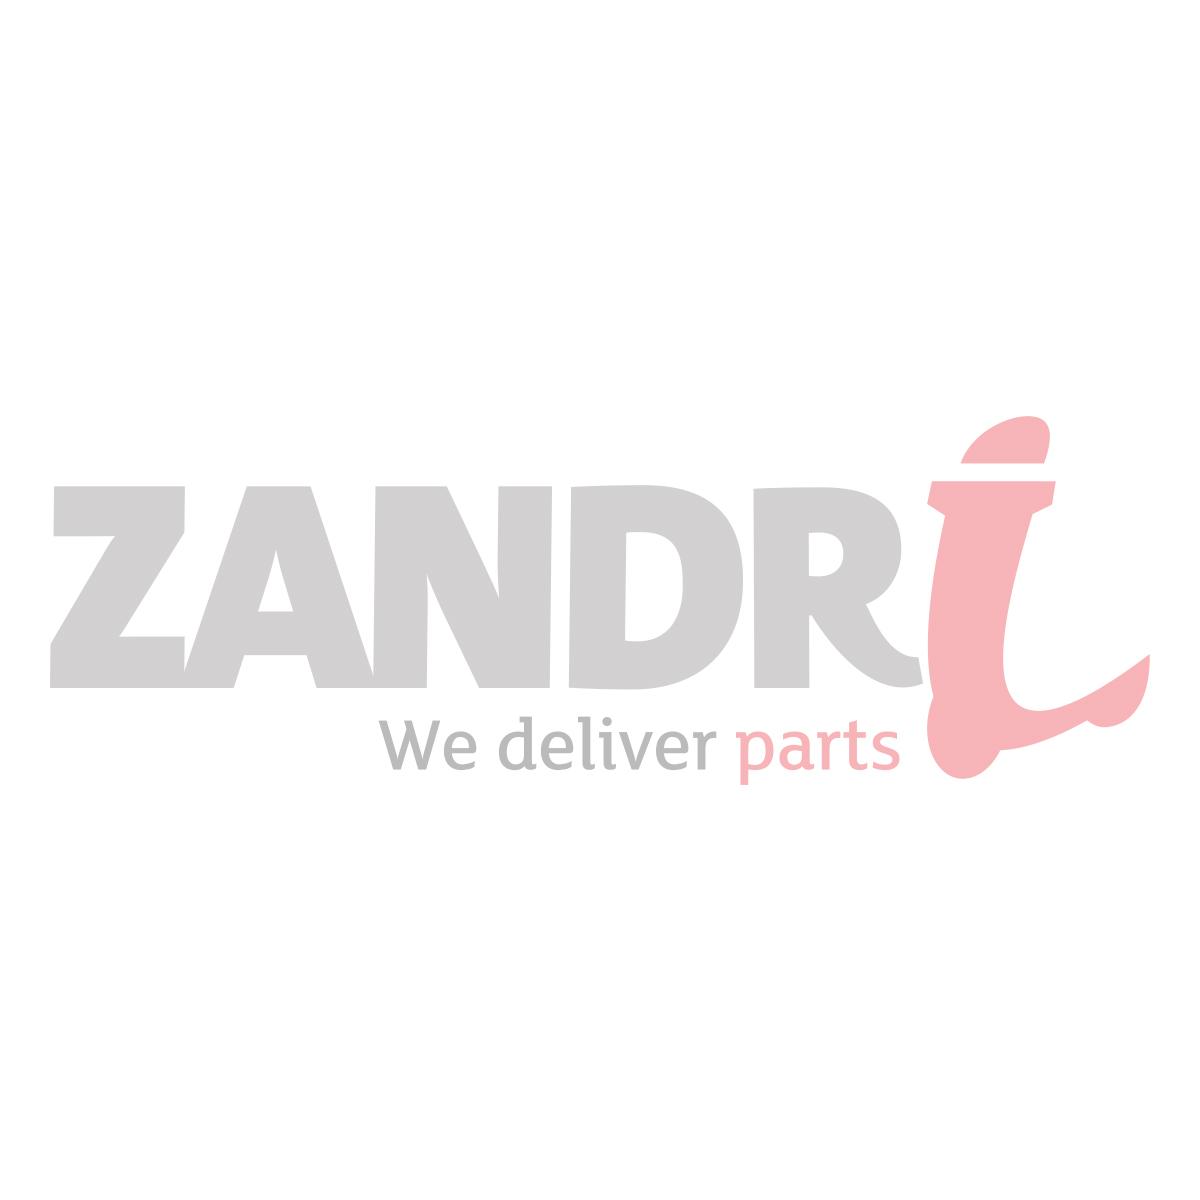 Telleraandrijving Peugeot Ludix / Elystar / Jet ctech / Tkr / Vivacity